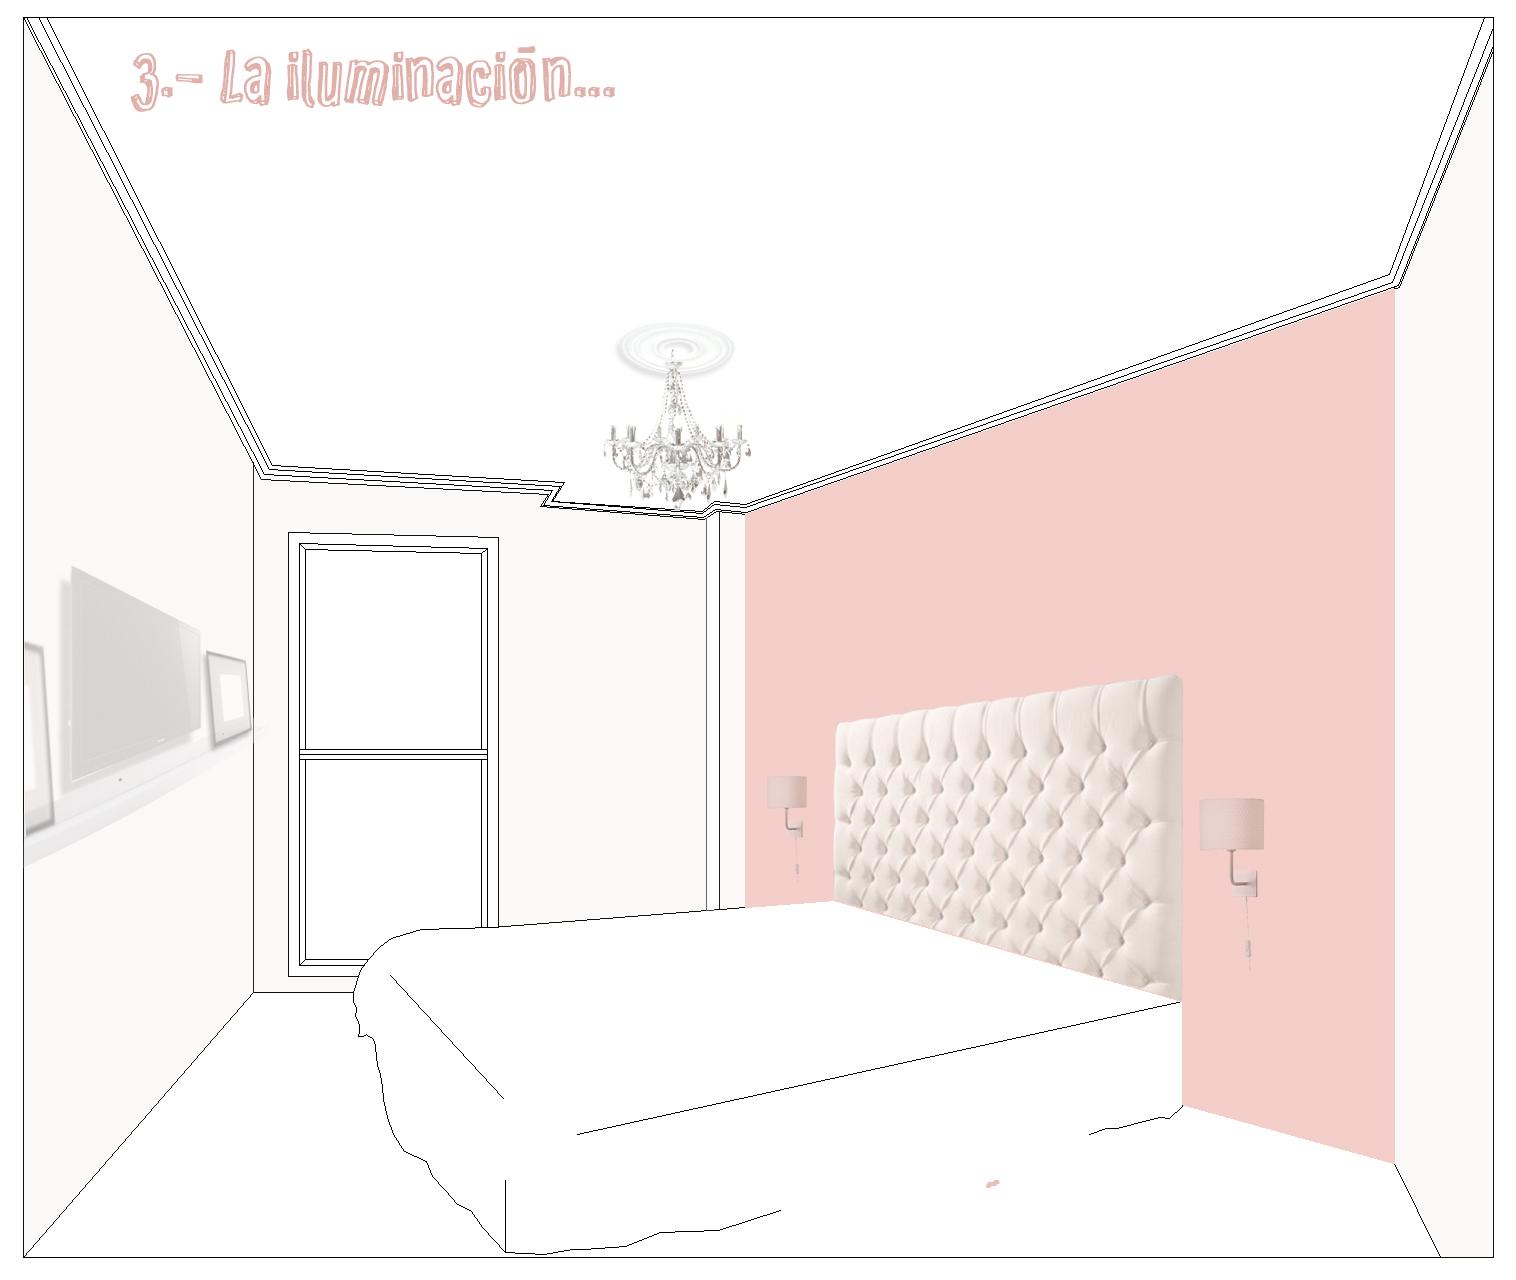 Hermanas bolena deco assistant la habitaci n de marta - Color topo pared ...